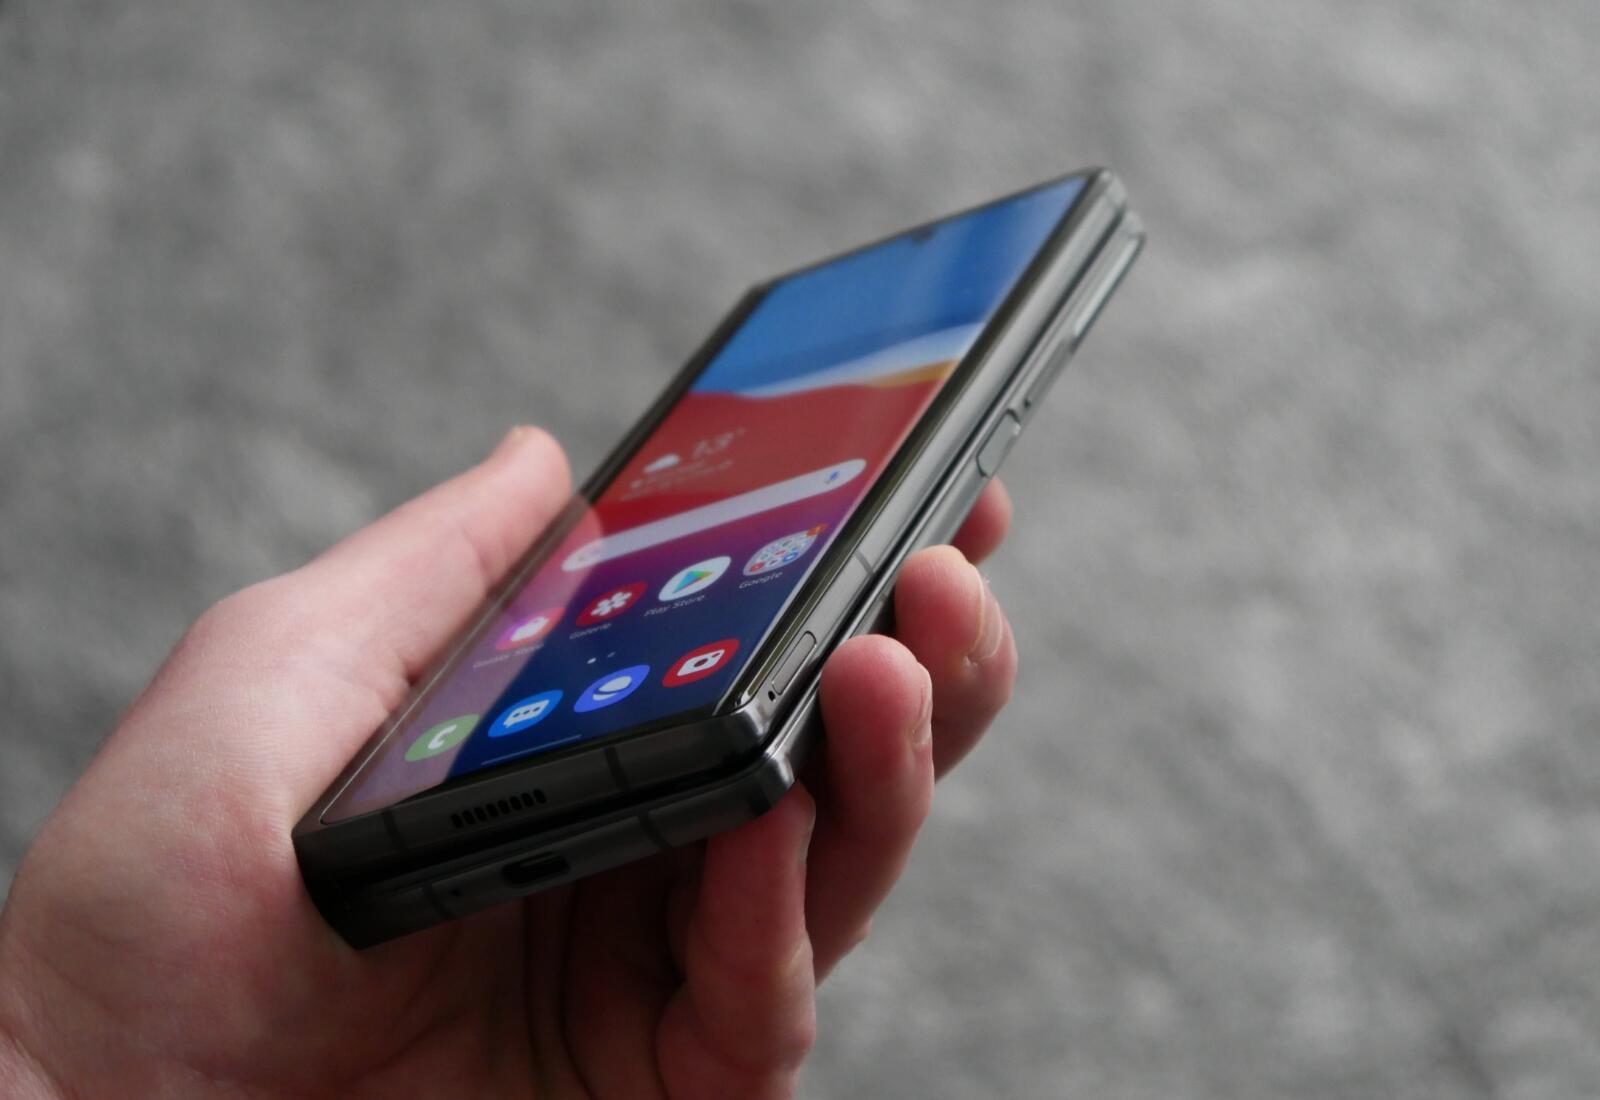 Samsung Galaxy Z Fold 2 Hand